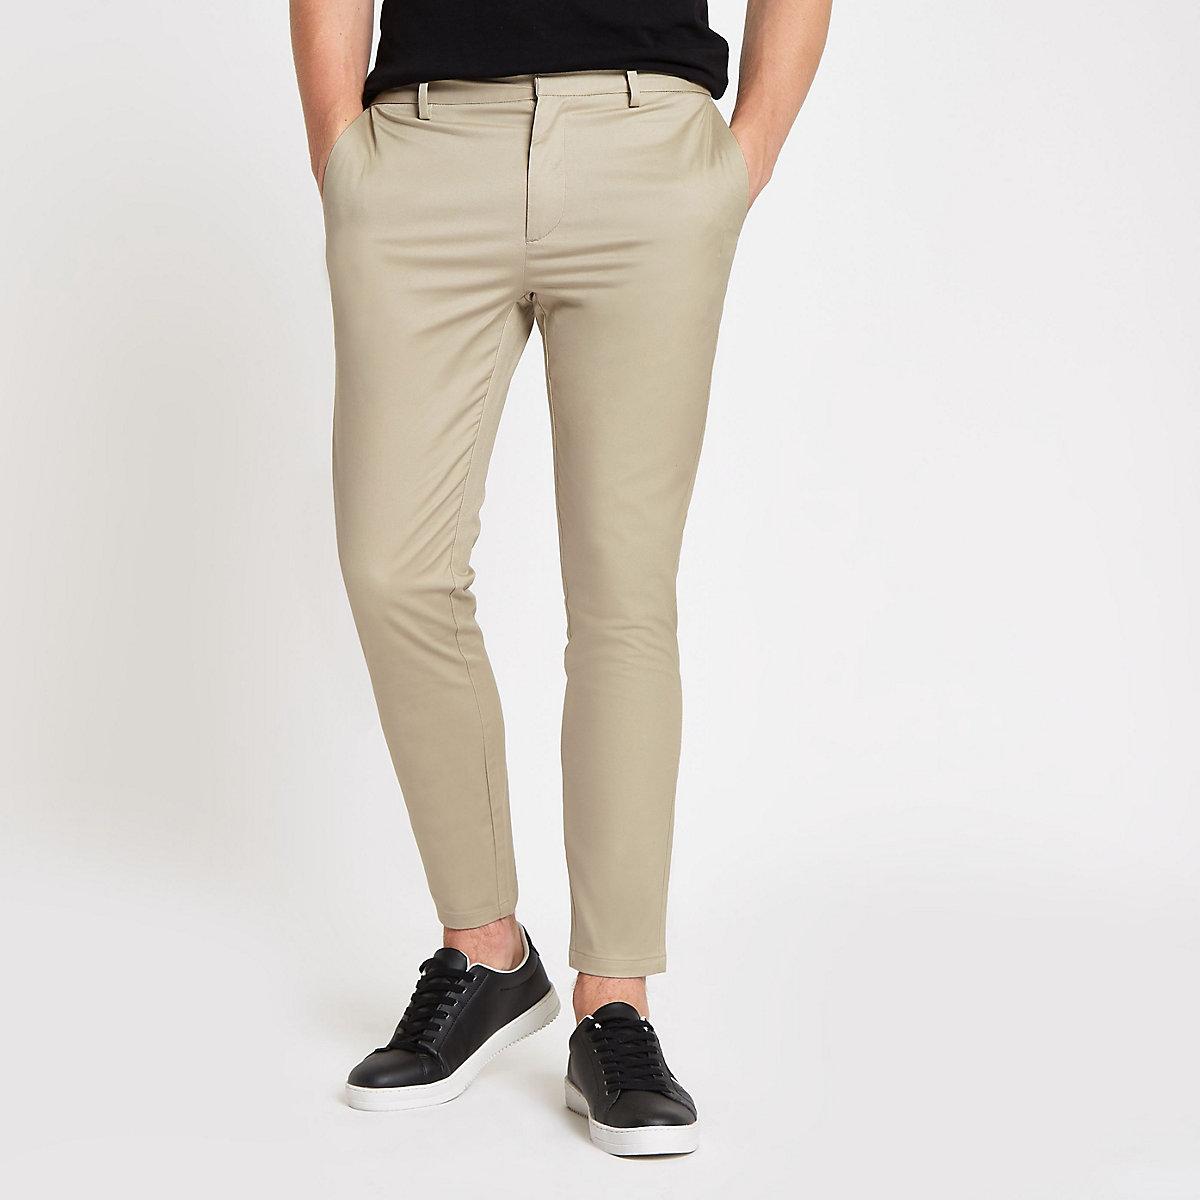 Stone smart skinny fit chino pants